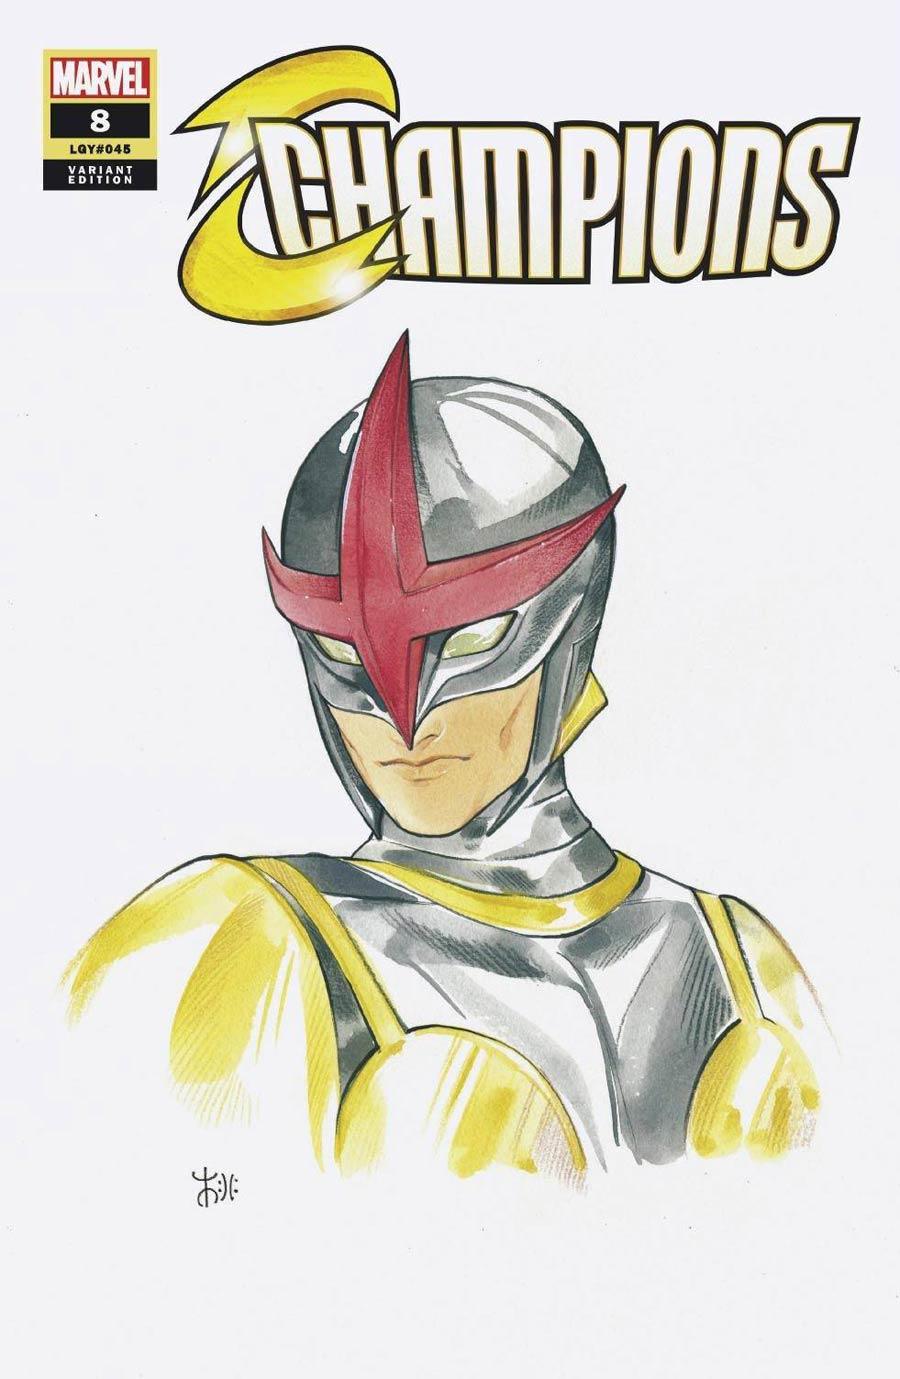 Champions (Marvel) Vol 4 #8 Cover B Variant Peach Momoko Marvel Anime Cover